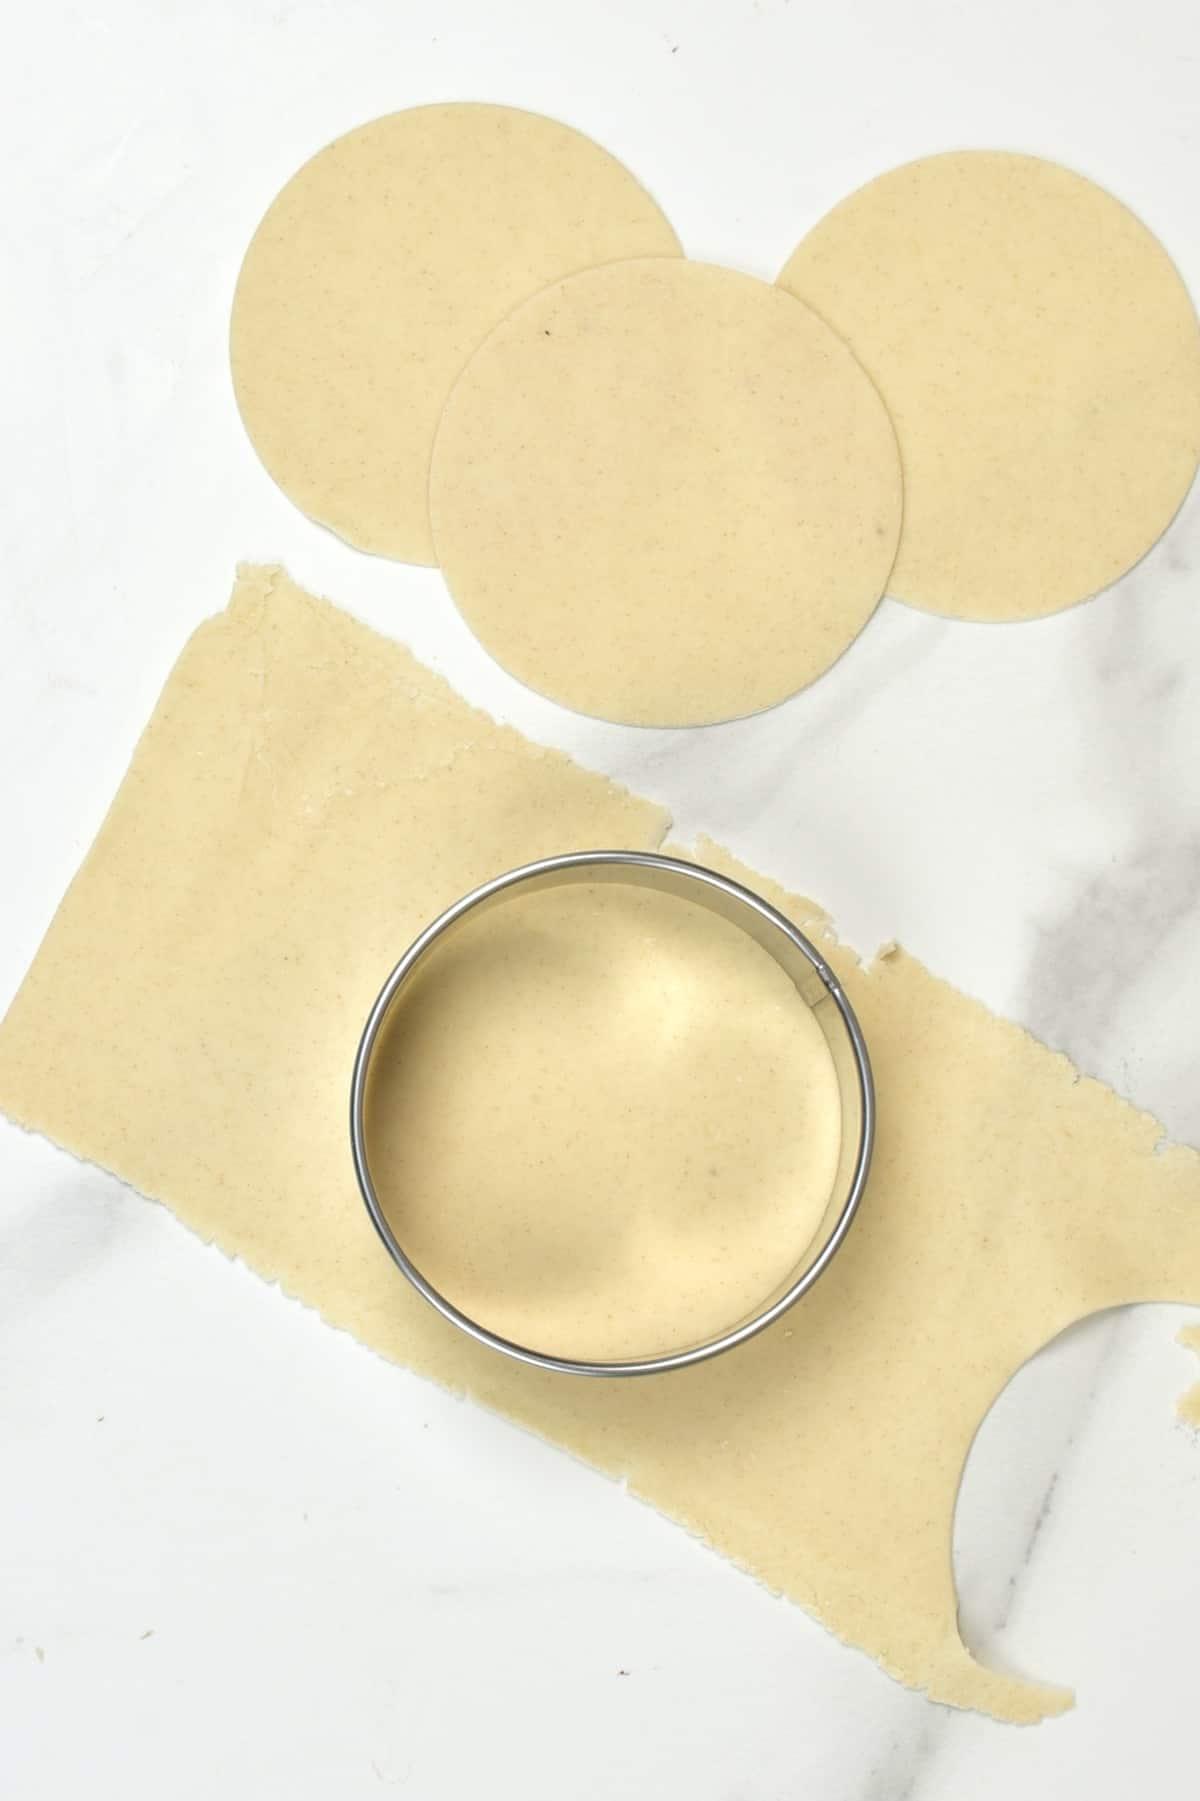 Cutting dumpling wrappers